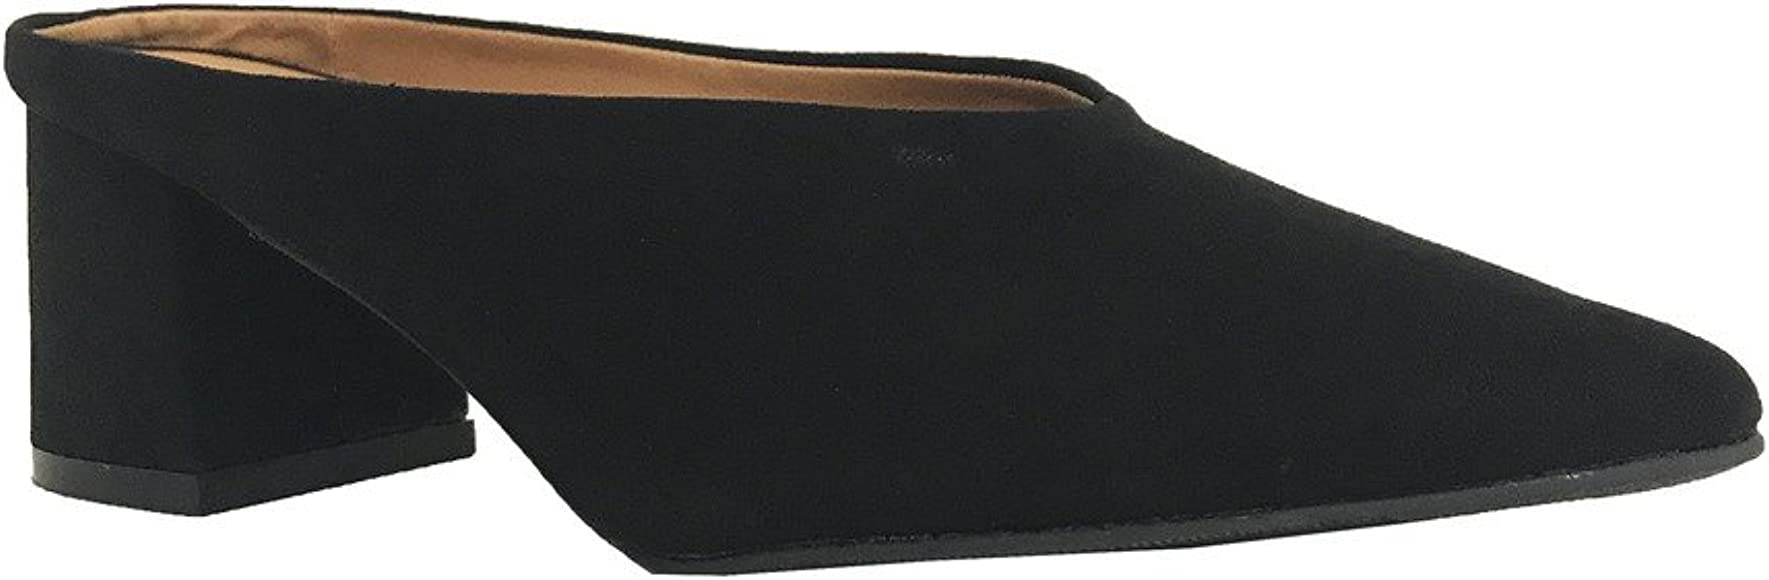 Pointed Toe Suede Chunky Heel Slip